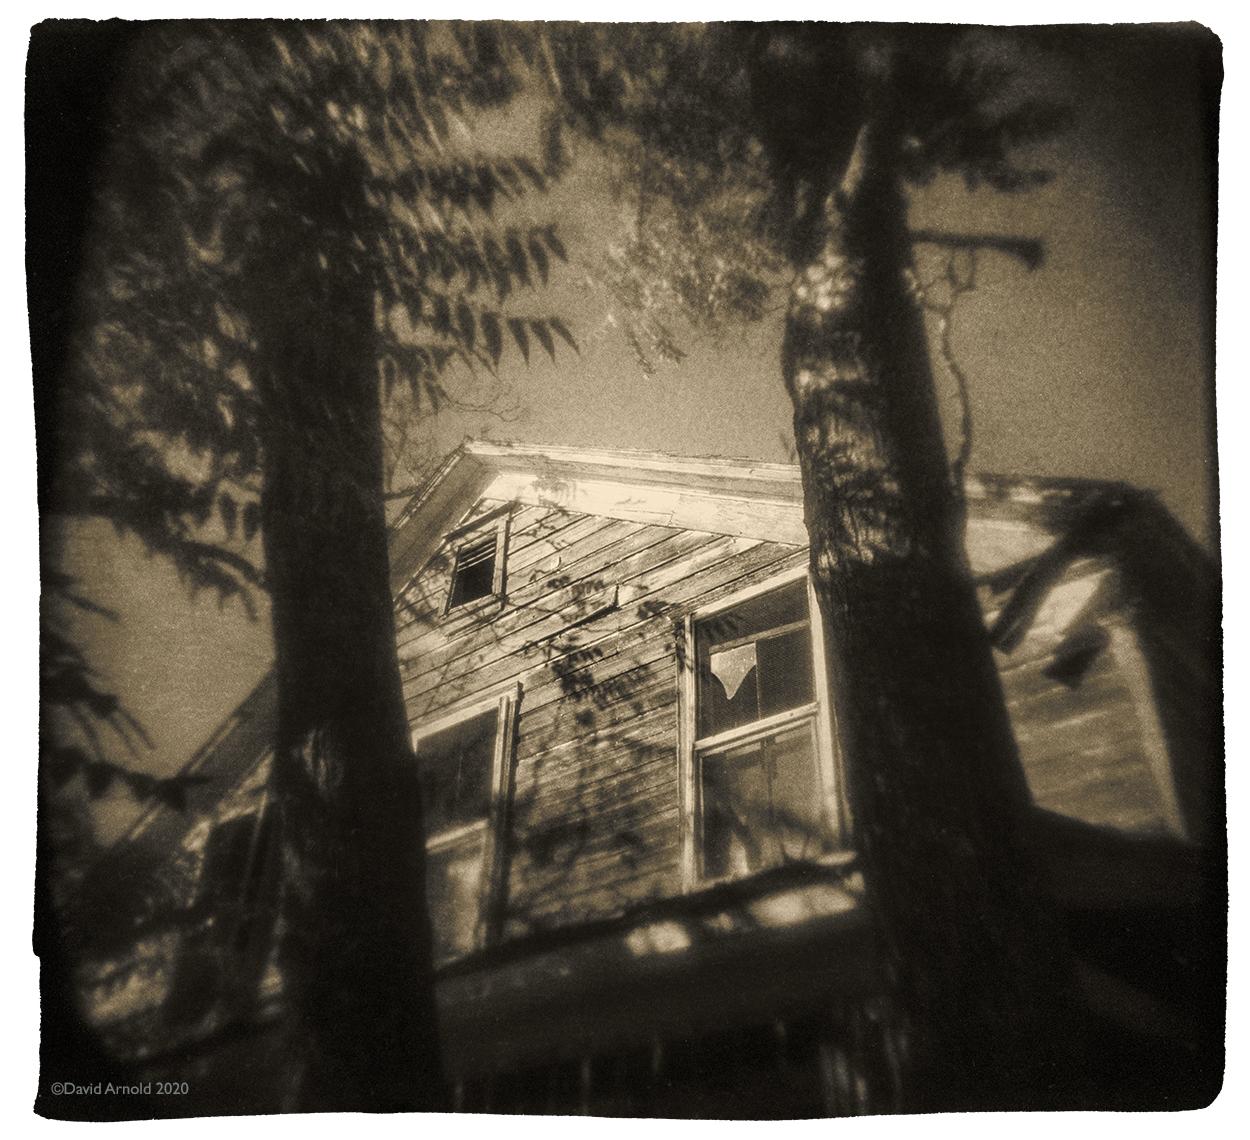 Two Pines, Window, Chinese Camp, Tuolumne County, California